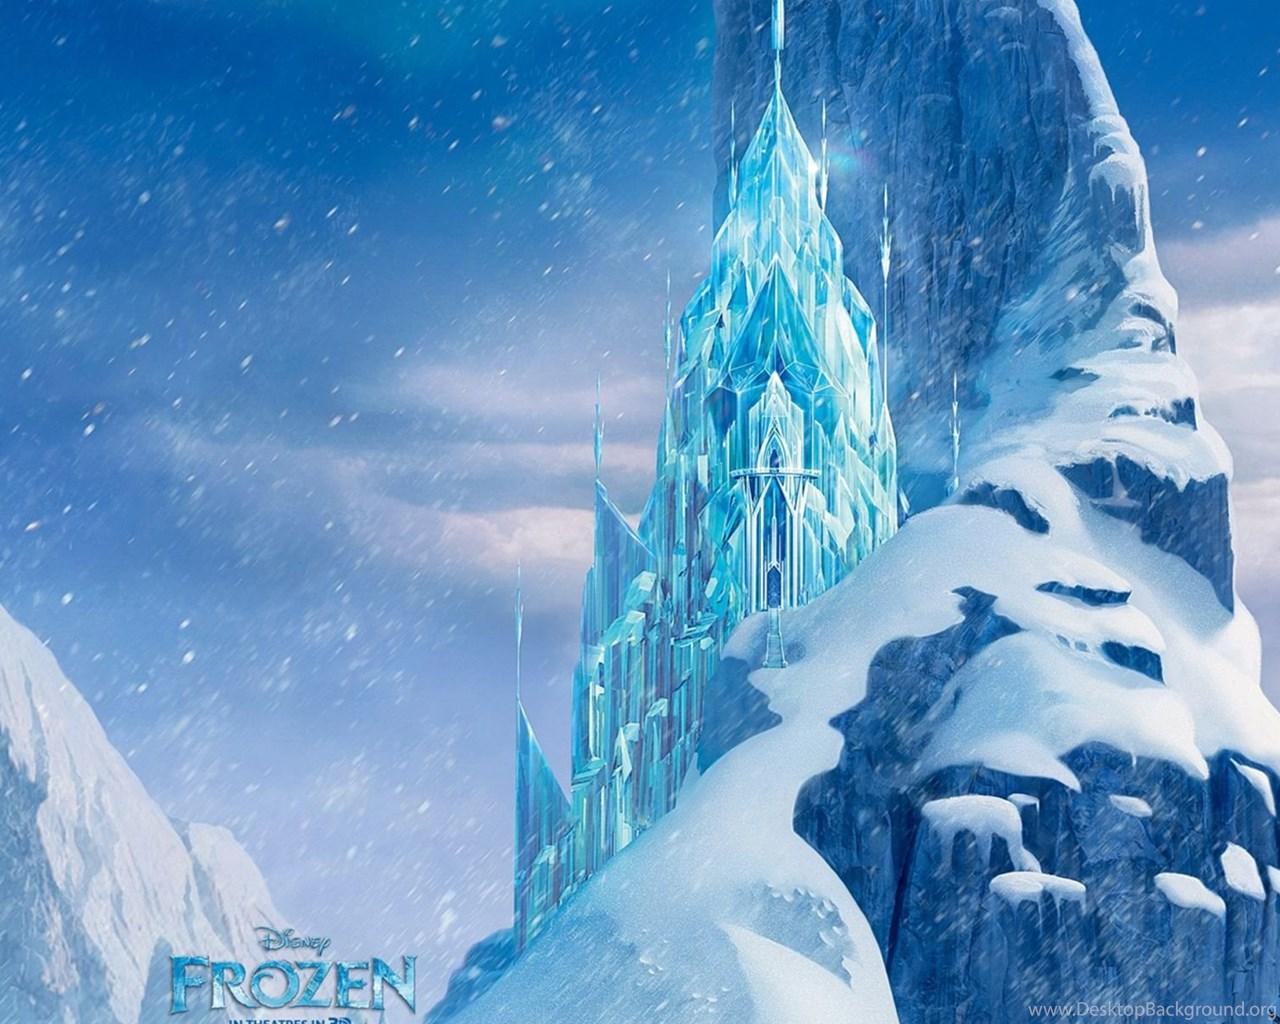 Icecastle Disney Frozen Movie HD Wallpapers Desktop Background